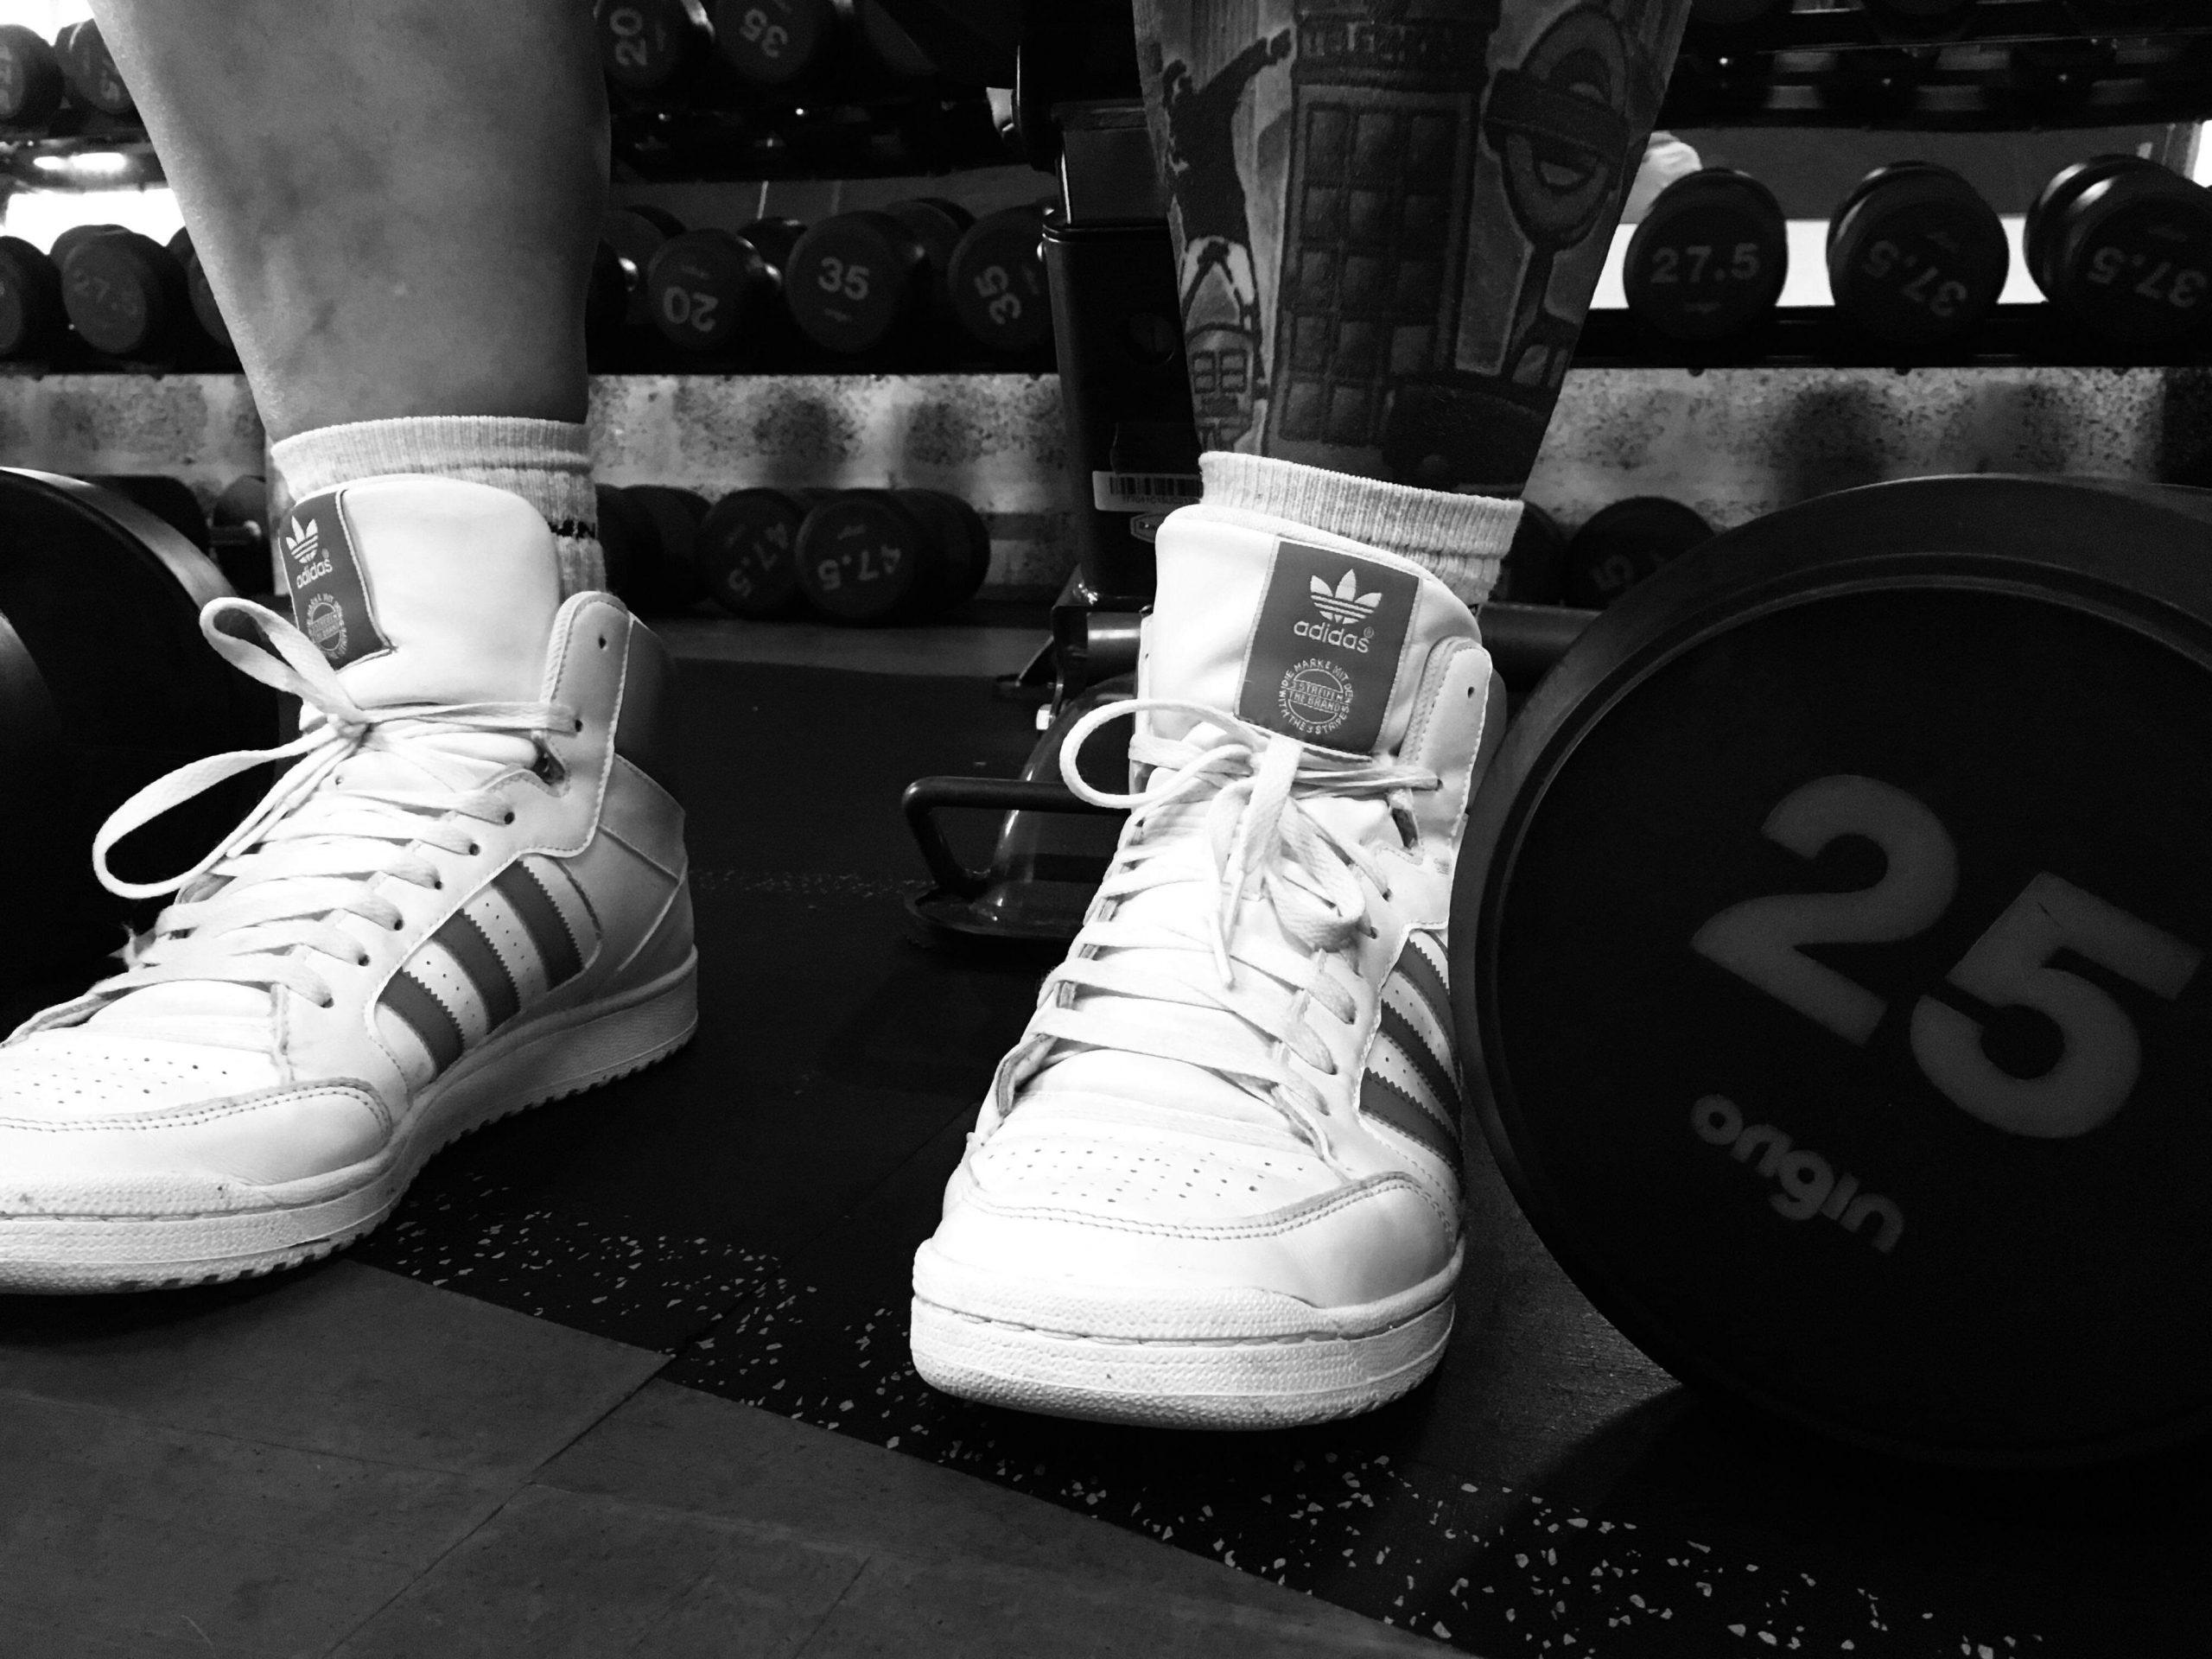 Silverback Gym Tain Highlands